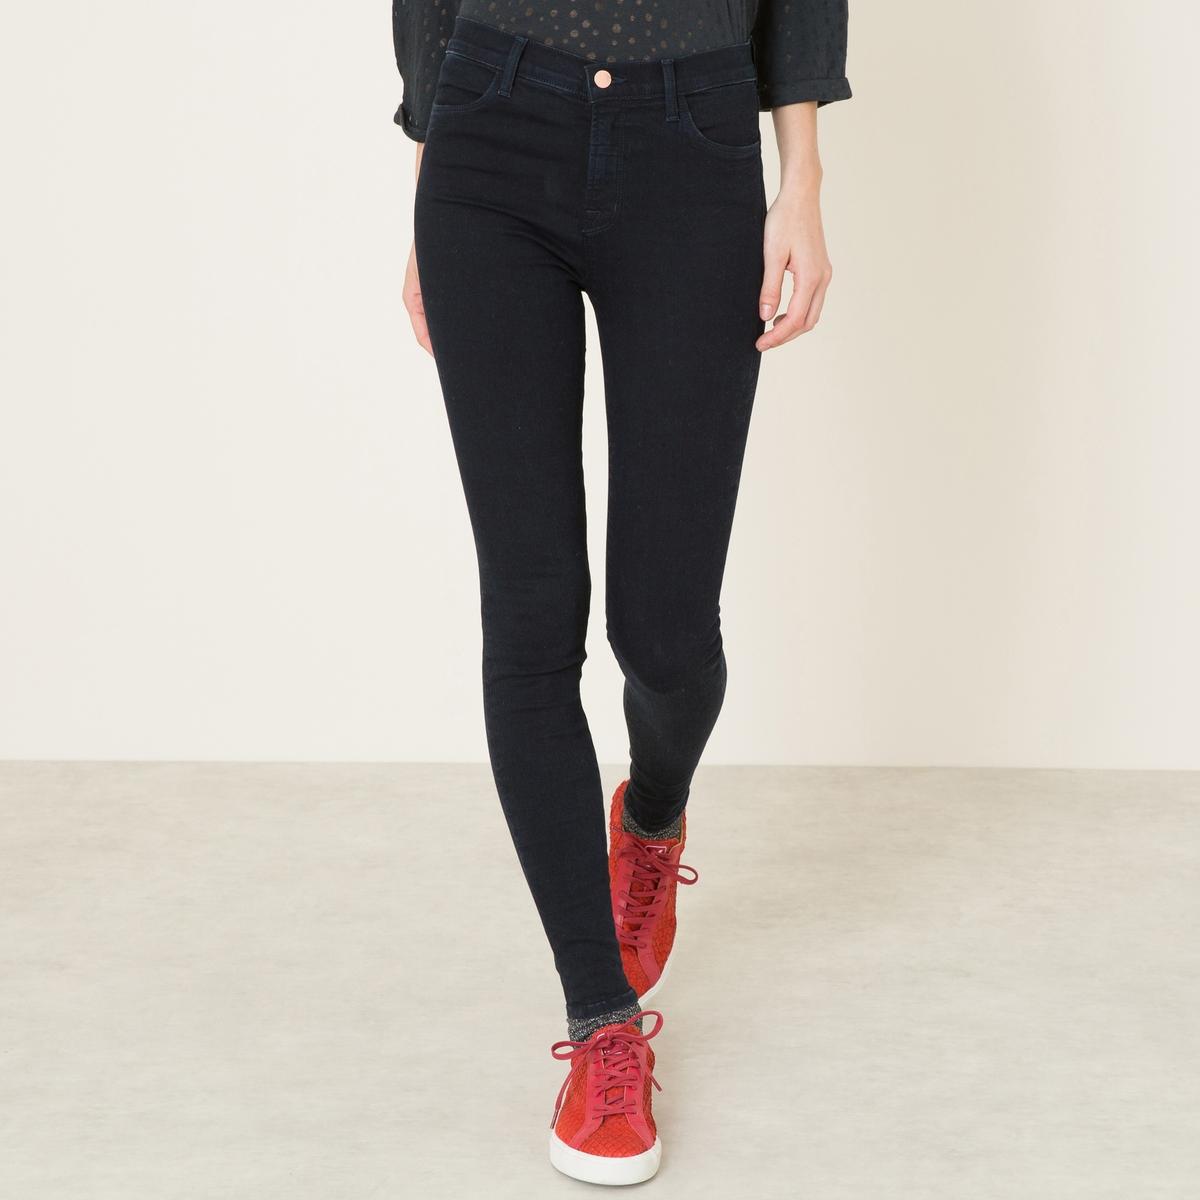 Джинсы MARIA SKINNY j brand зауженные джинсы